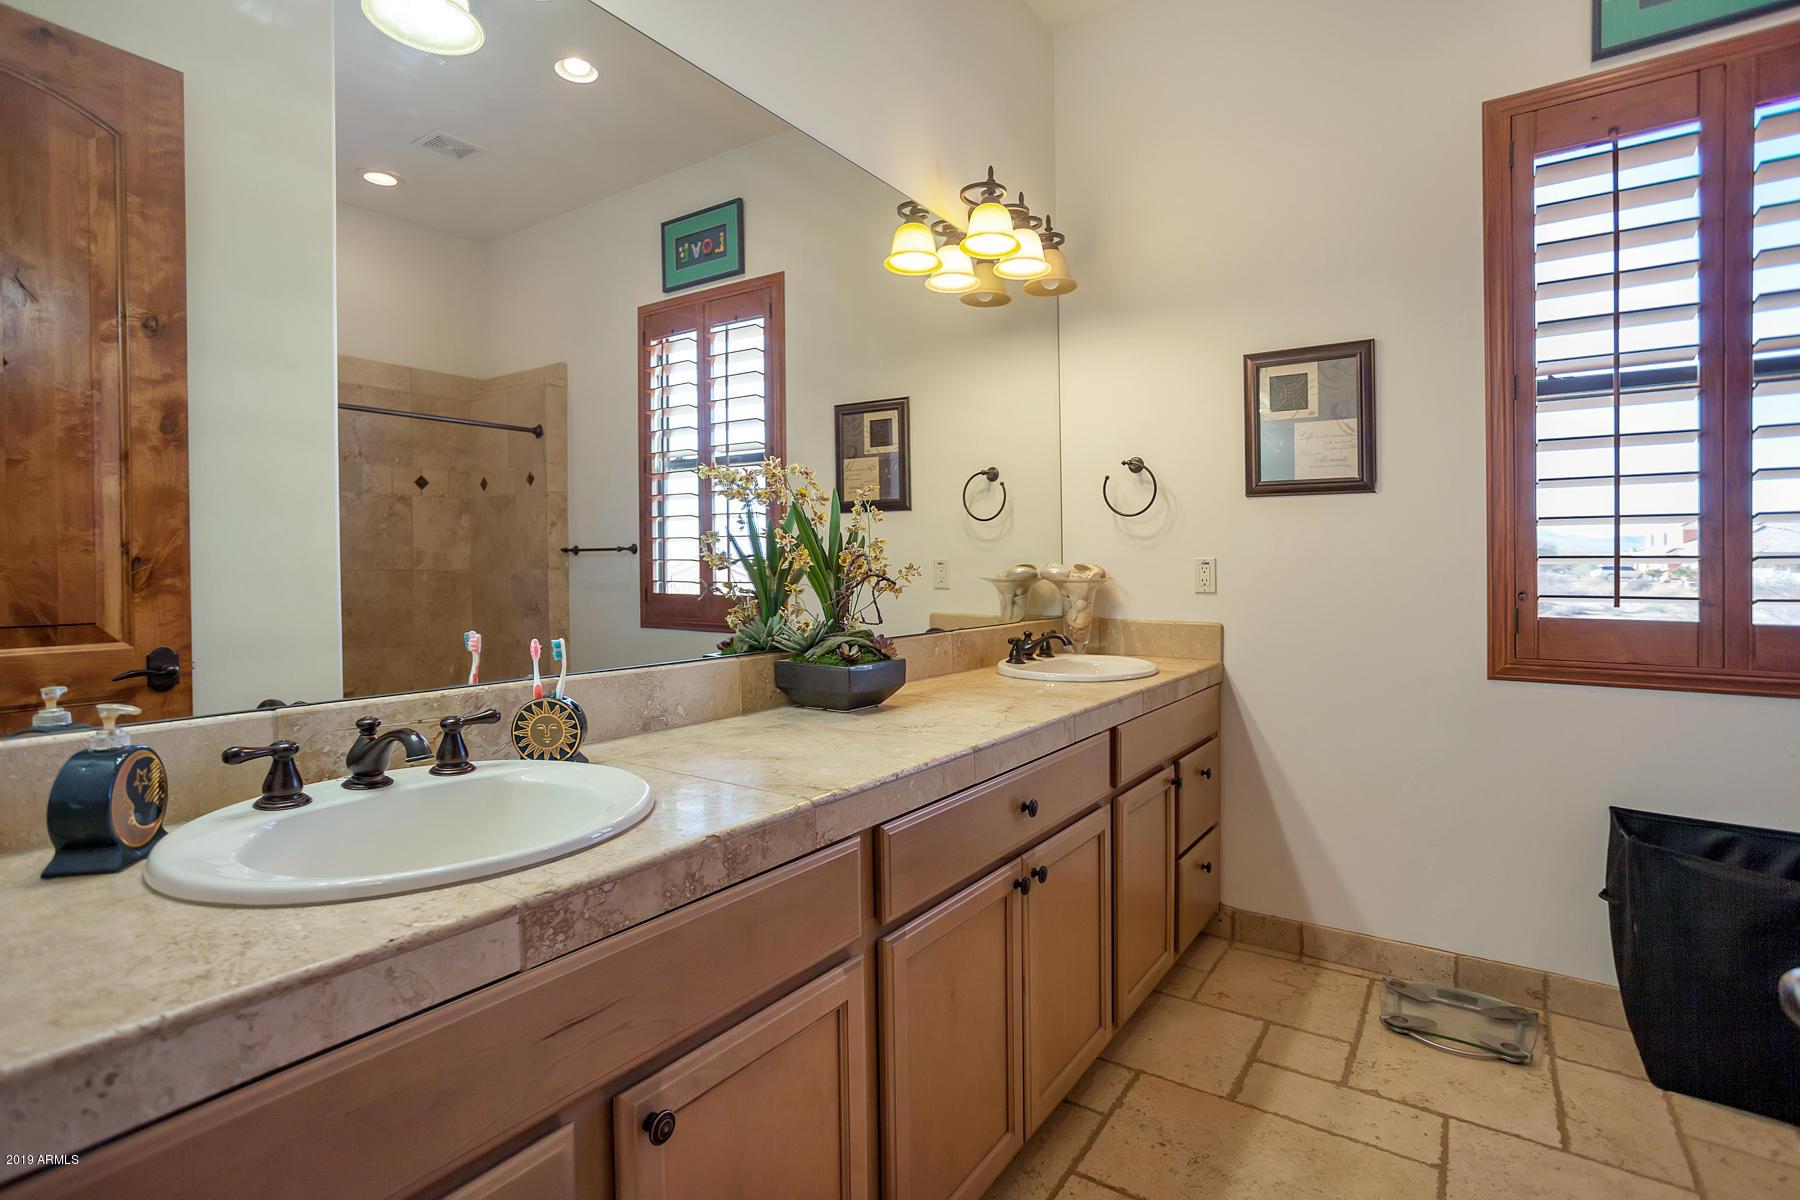 MLS 5869770 29525 N 164TH Place, Scottsdale, AZ 85262 Scottsdale AZ Guest House